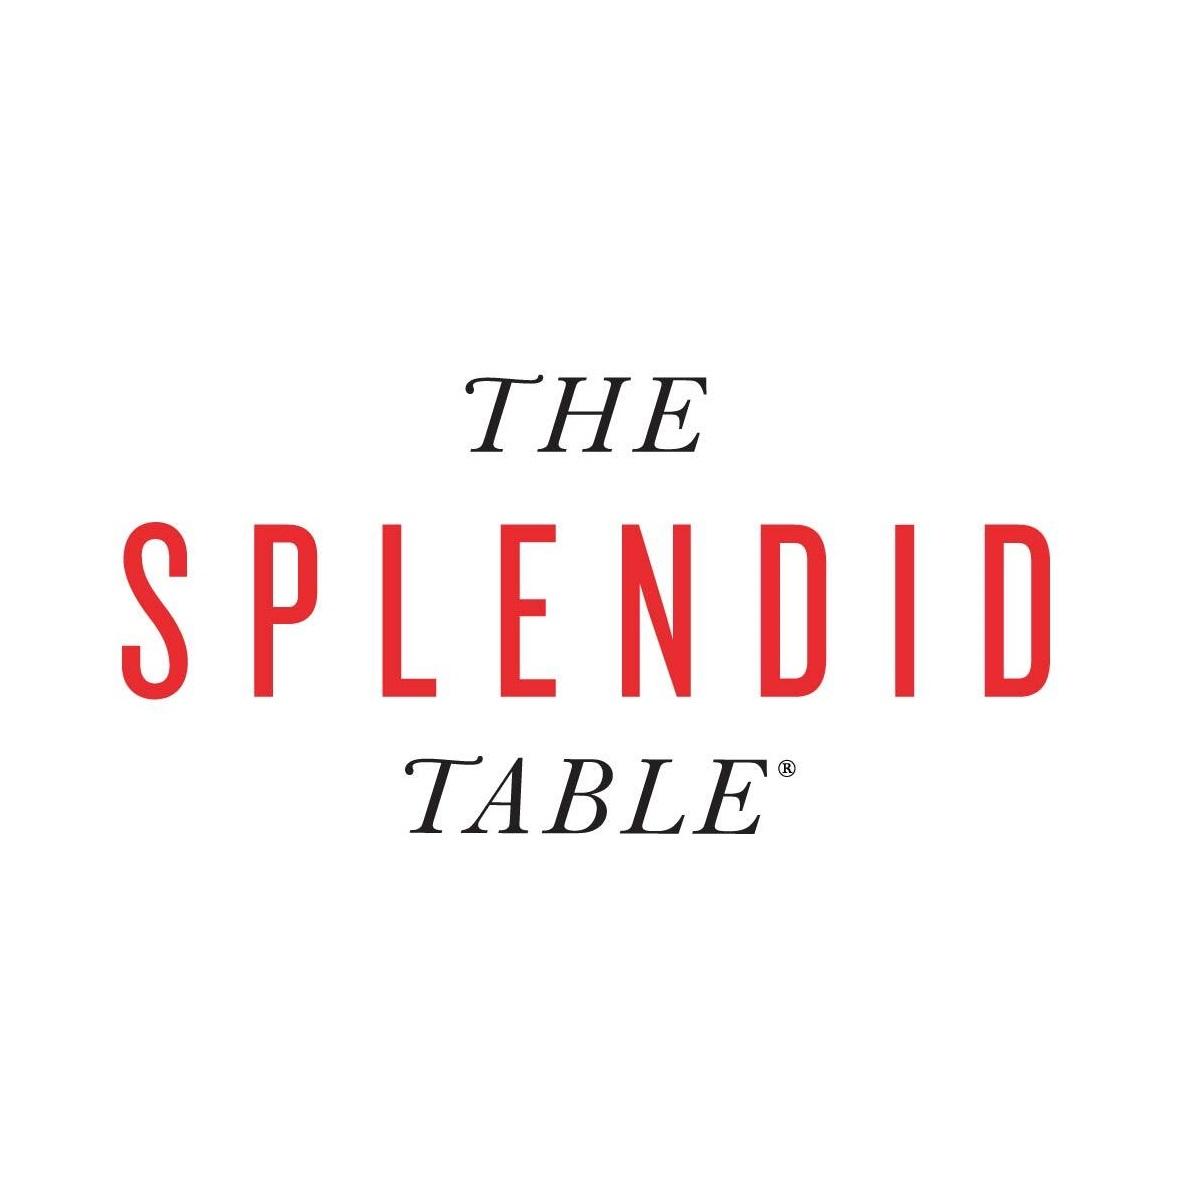 Four Persian Cooks    LISTEN AT THE SPLENDID TABLE